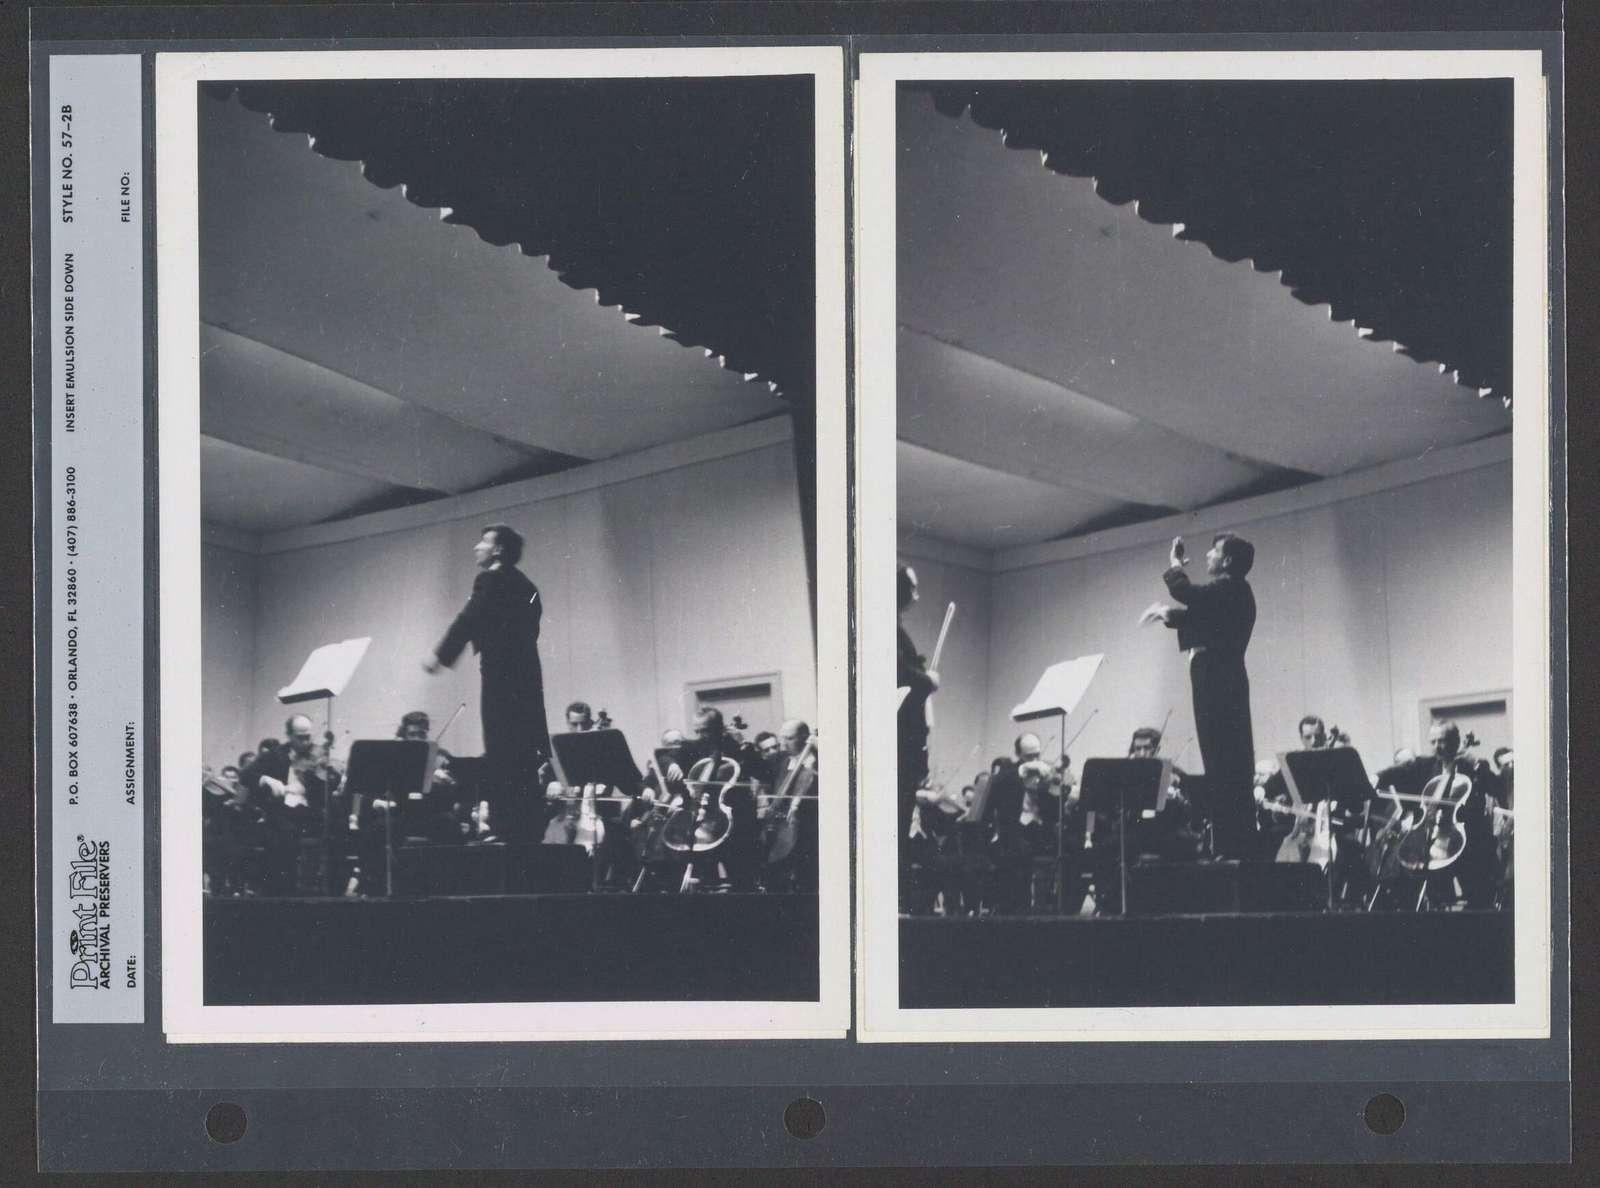 Leonard Bernstein conducting with Isaac Stern as soloist, 1956